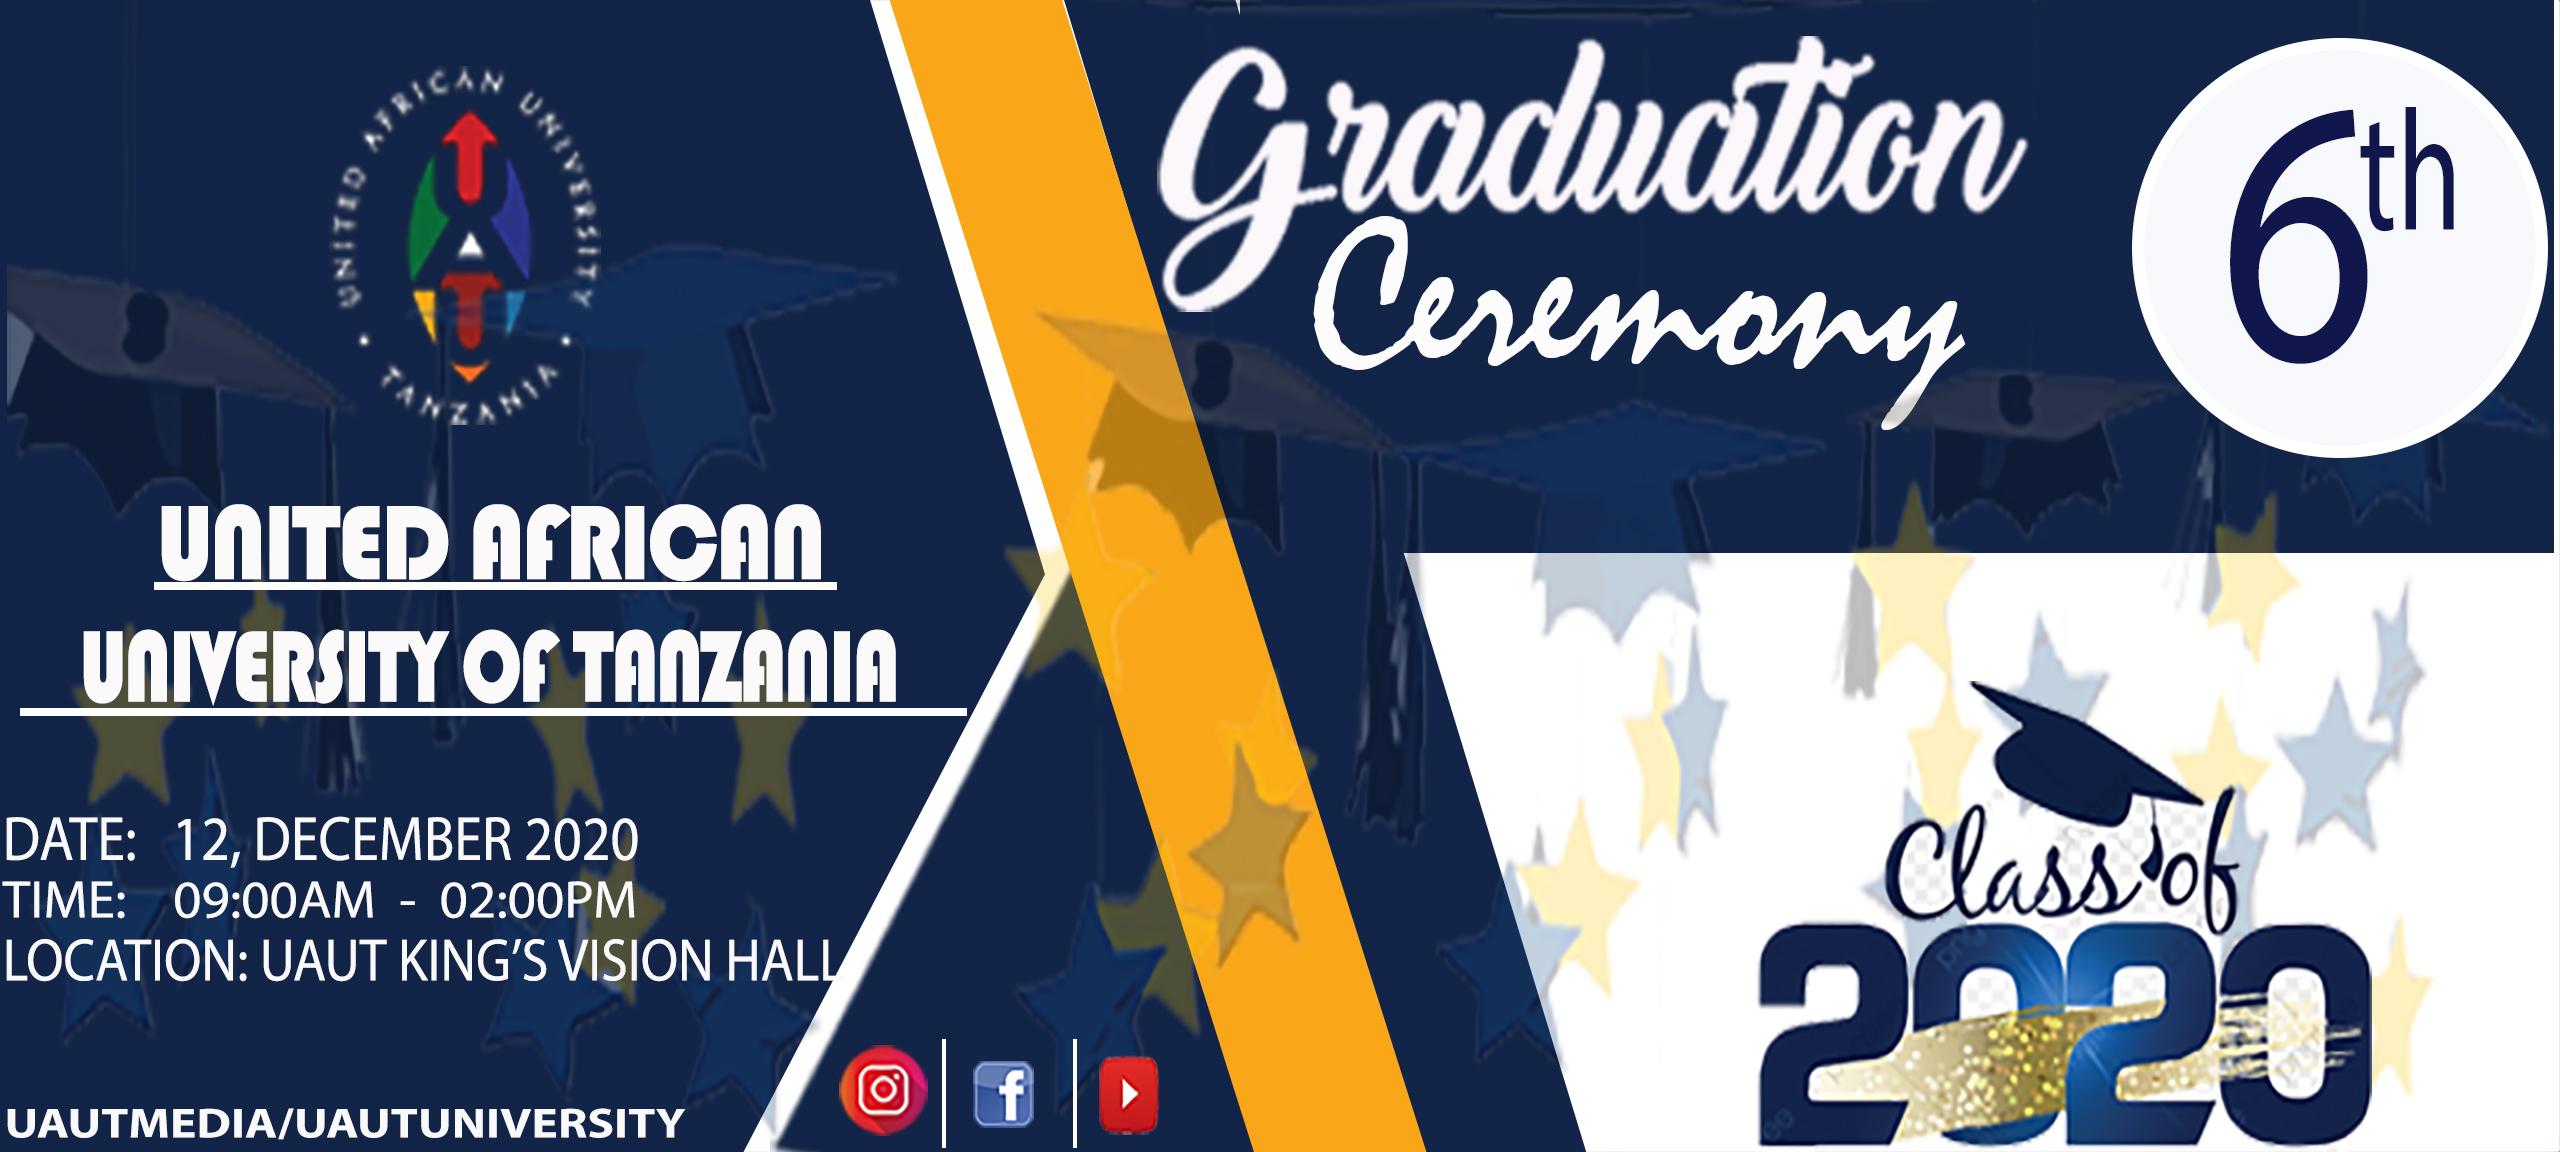 6th Graduation Ceremony